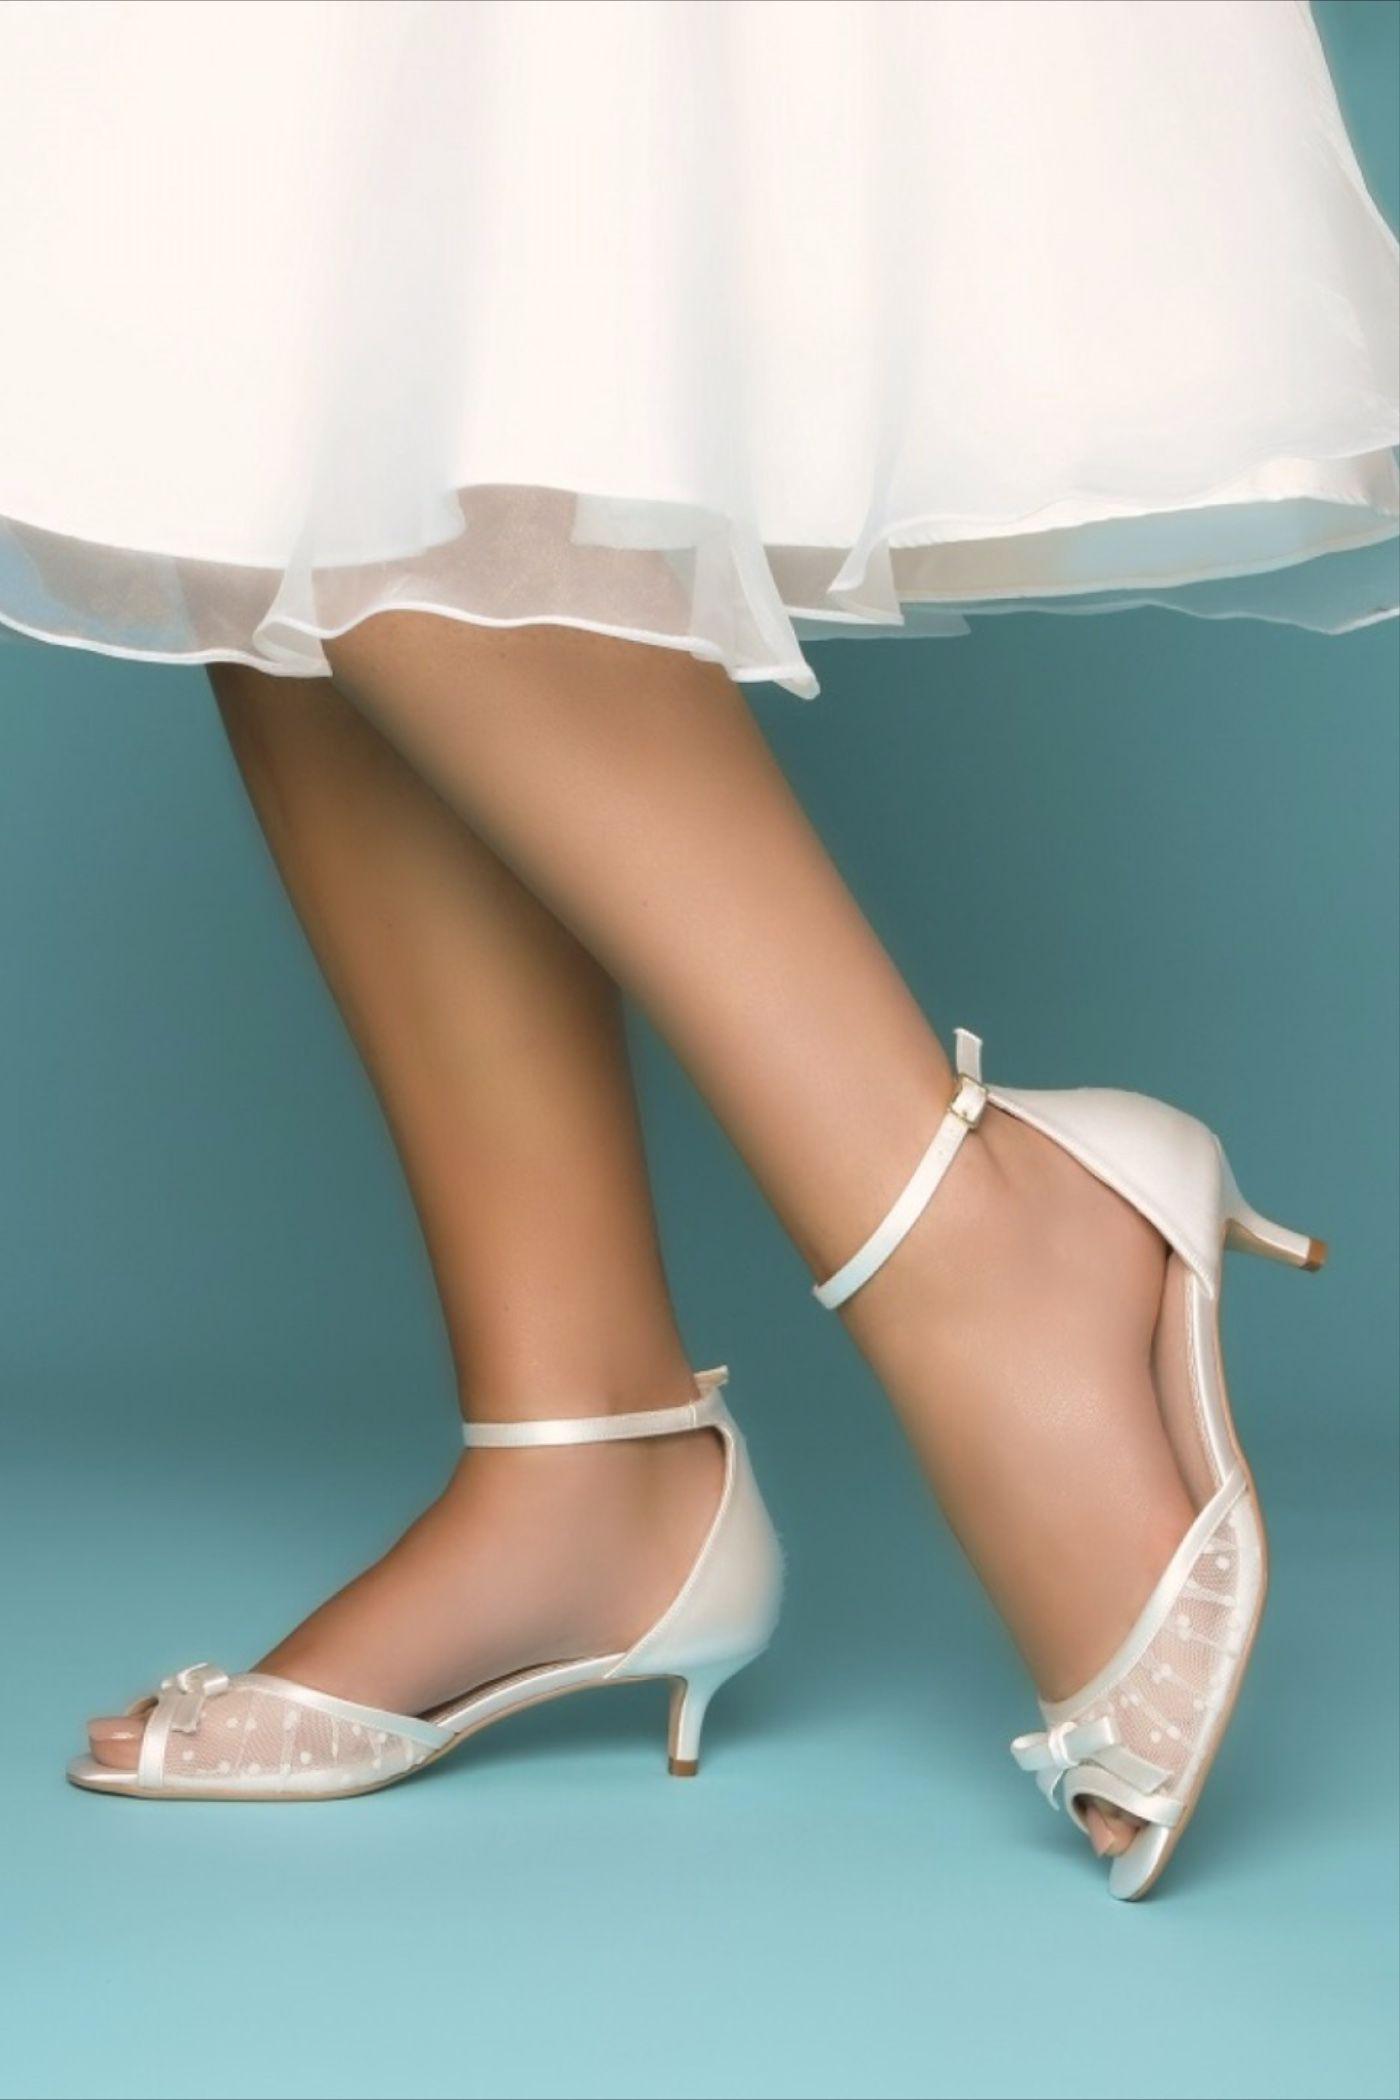 Perfect Bridal Eadie Ivory Polka Dot Mesh Kitten Heel Bridal Sandals | Low Heel Wedding Shoes